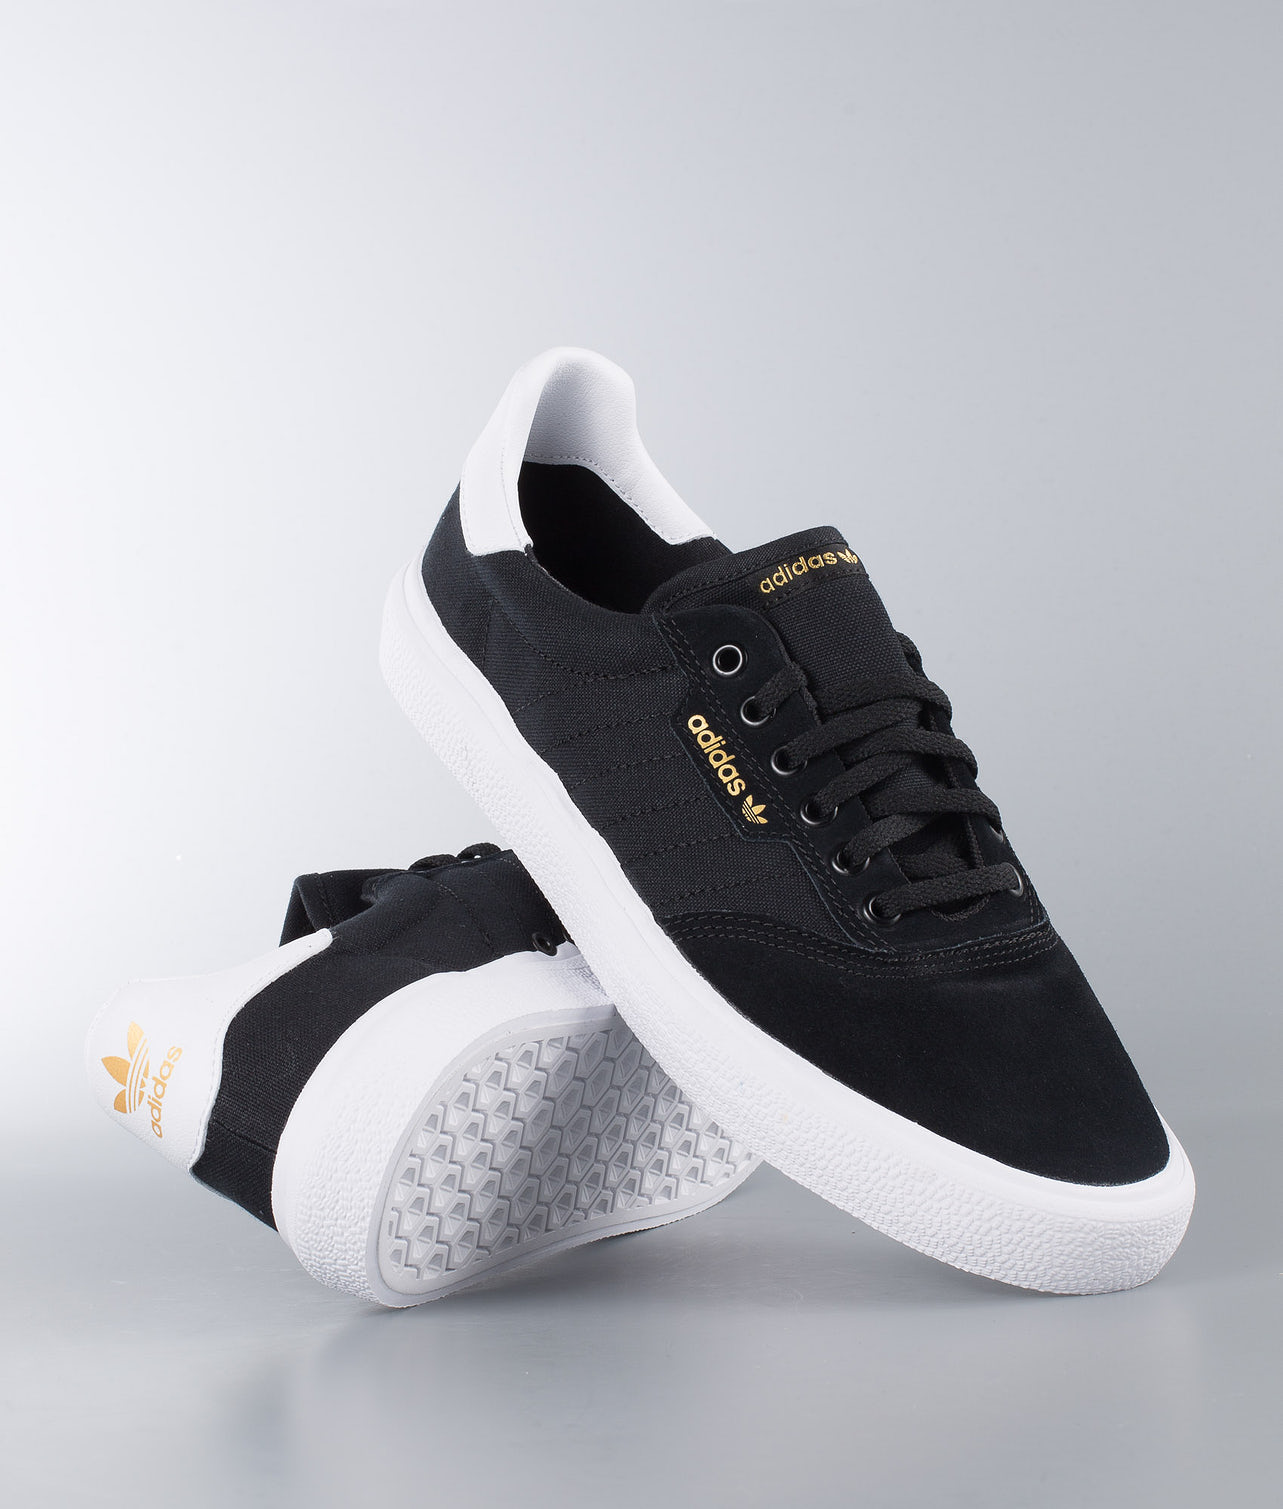 Adidas Skateboarding 3MC Sko Core Black/Ftwr White/Core Black